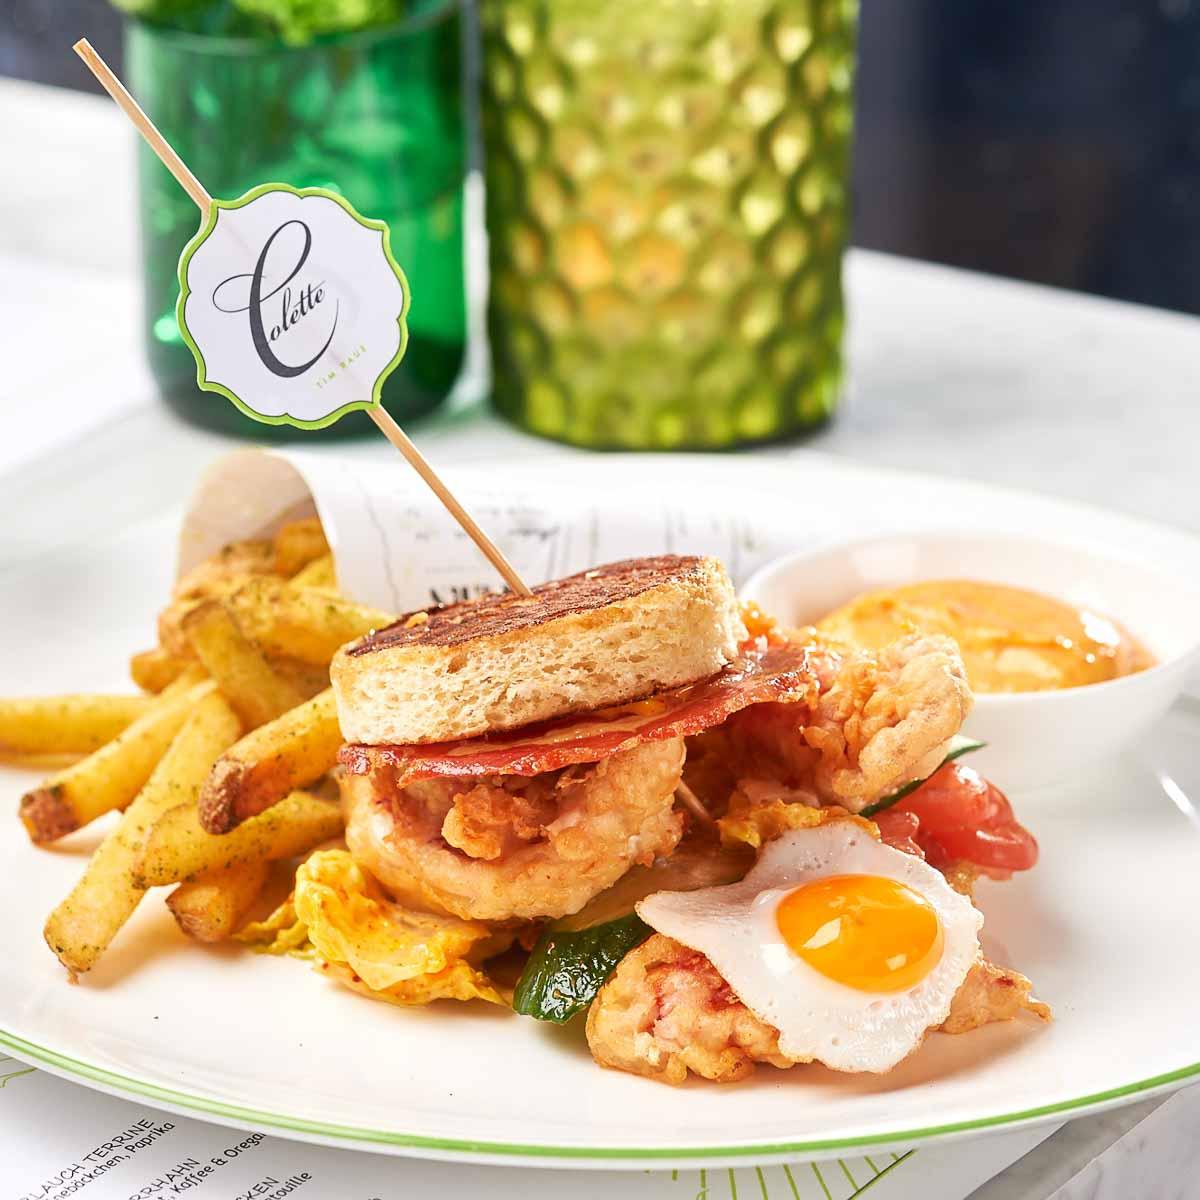 Brasserie Colette Tim Raue Clubsandwich